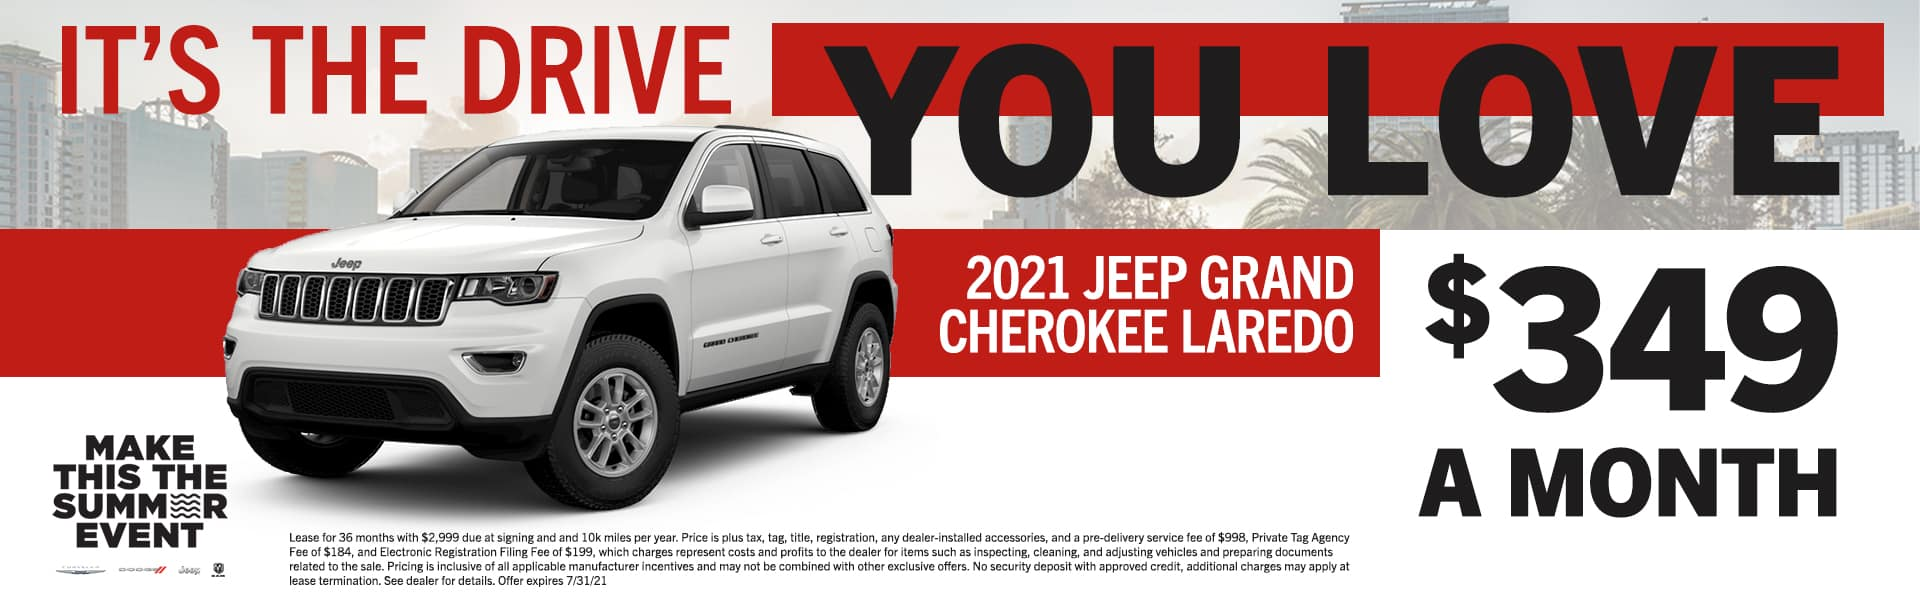 206-0721-CFC1147_July_SL-Grand-Cherokee-Laredo